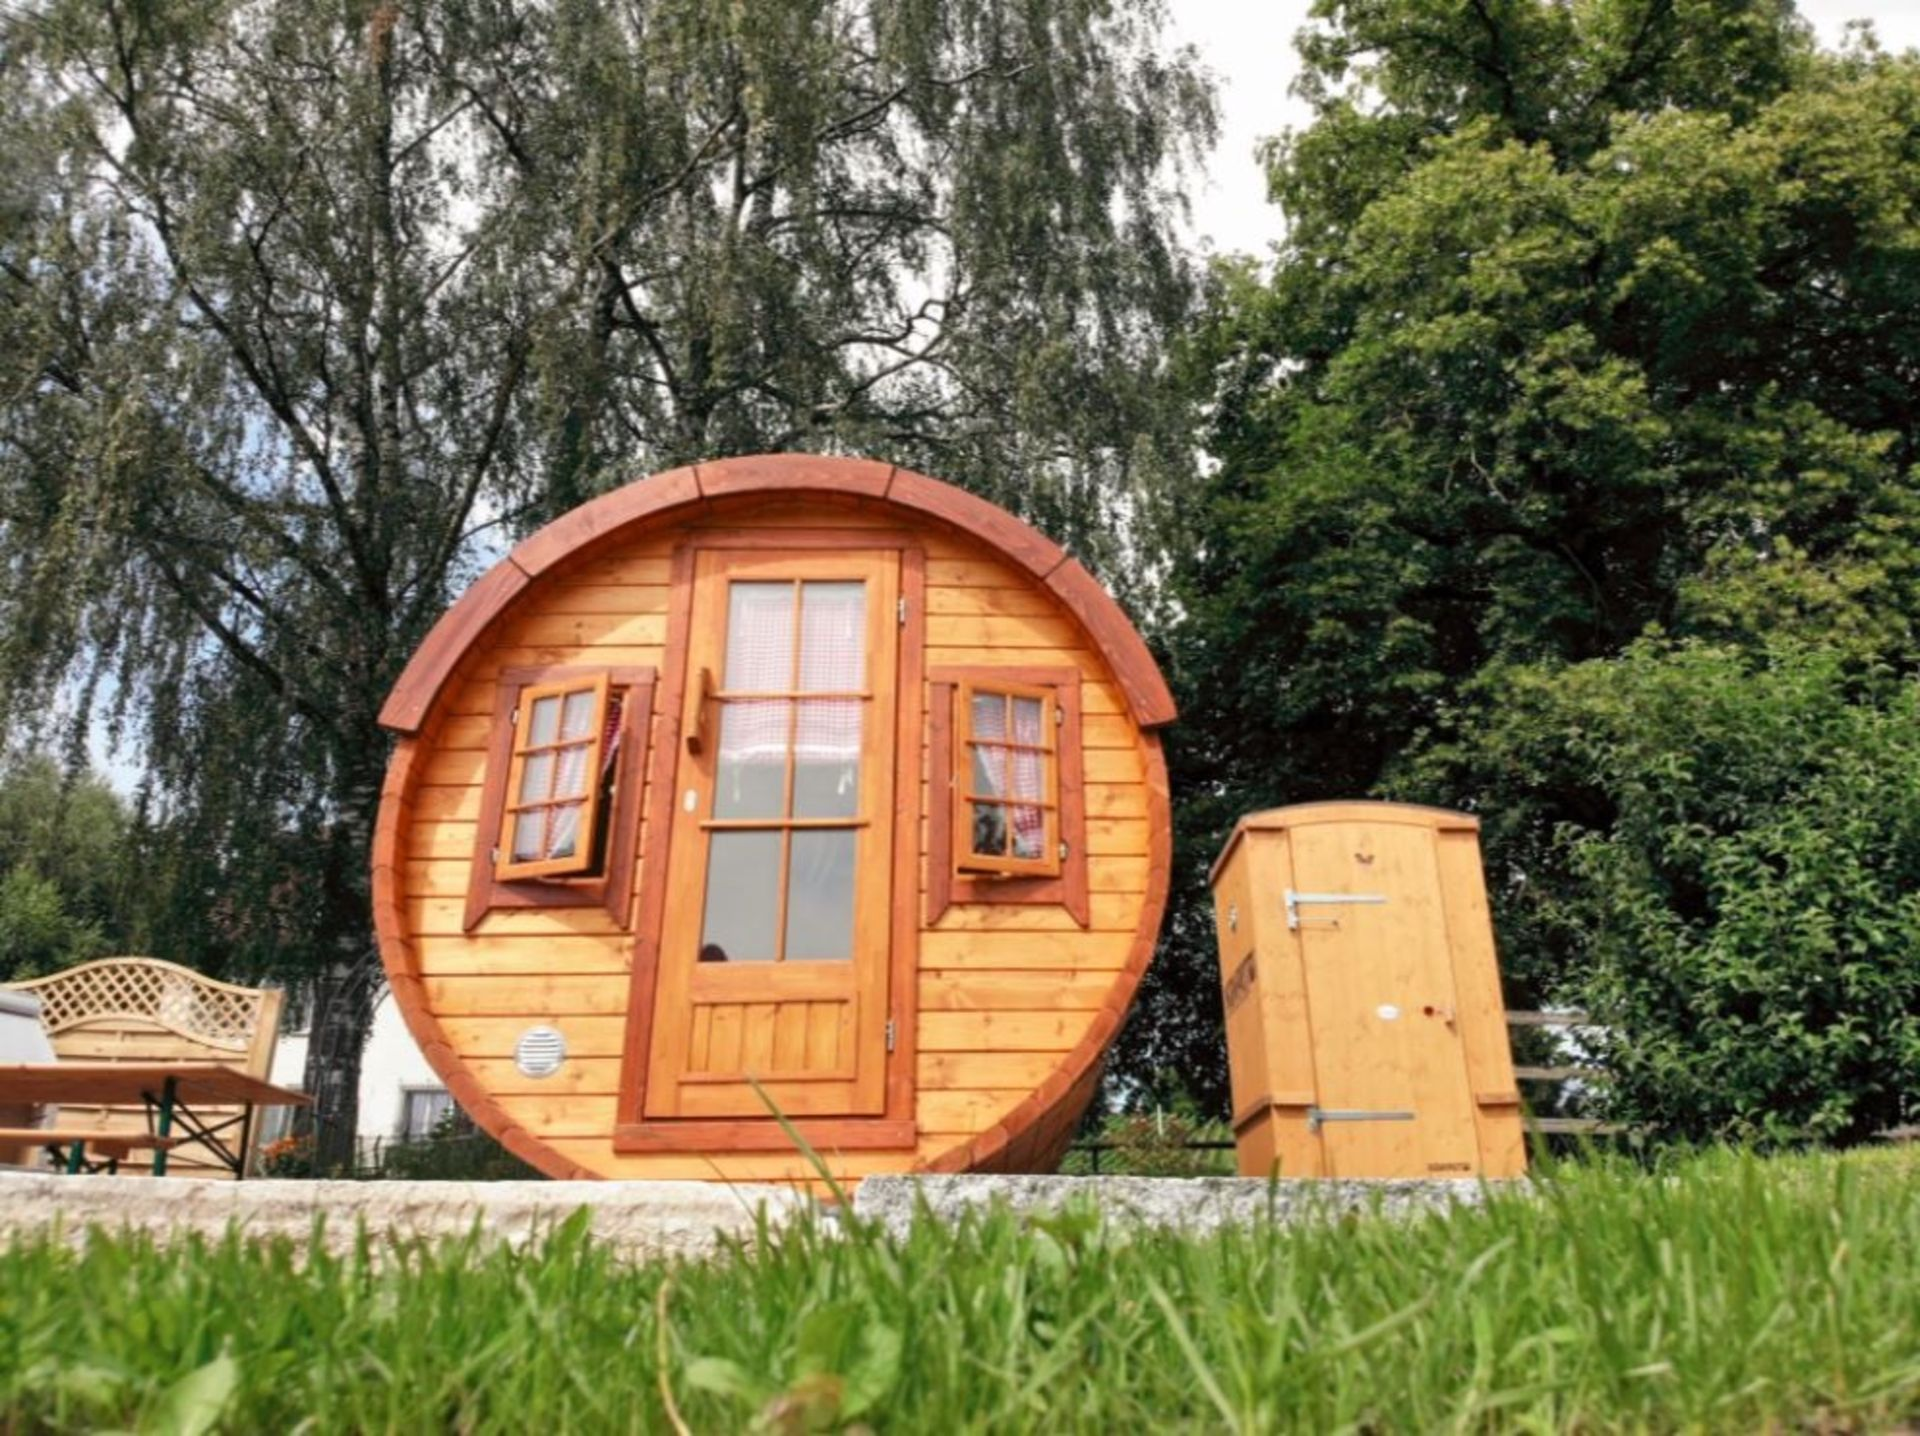 Lot 19033 - + VAT Brand New 2.2 x 4.4m Barrel For Sleeping - Family Size - Sleeping & Sitting Rooms Inside -